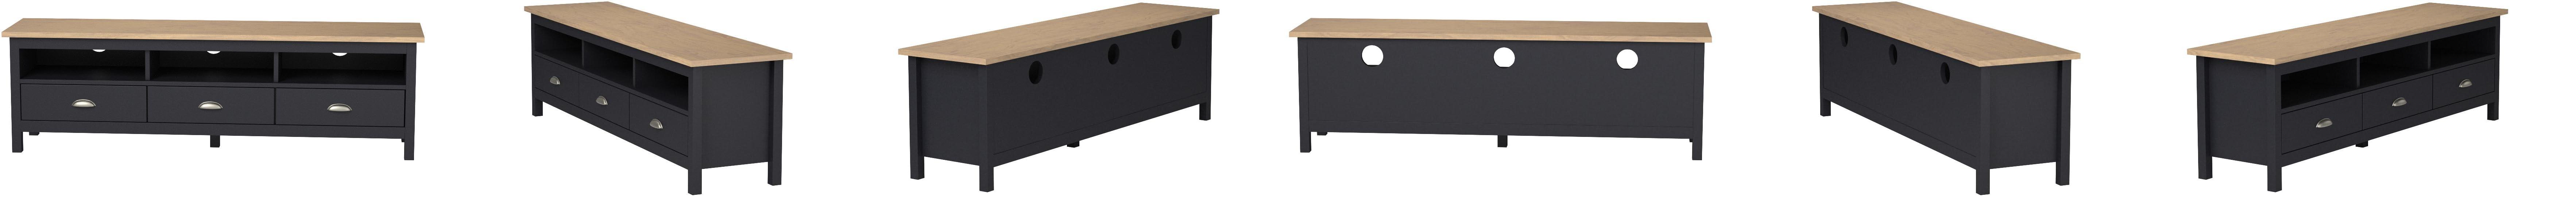 vs venta stock meuble tv bora bora 3 tiroirs fabrique en bois de pin massif gris anthracite 158 cm